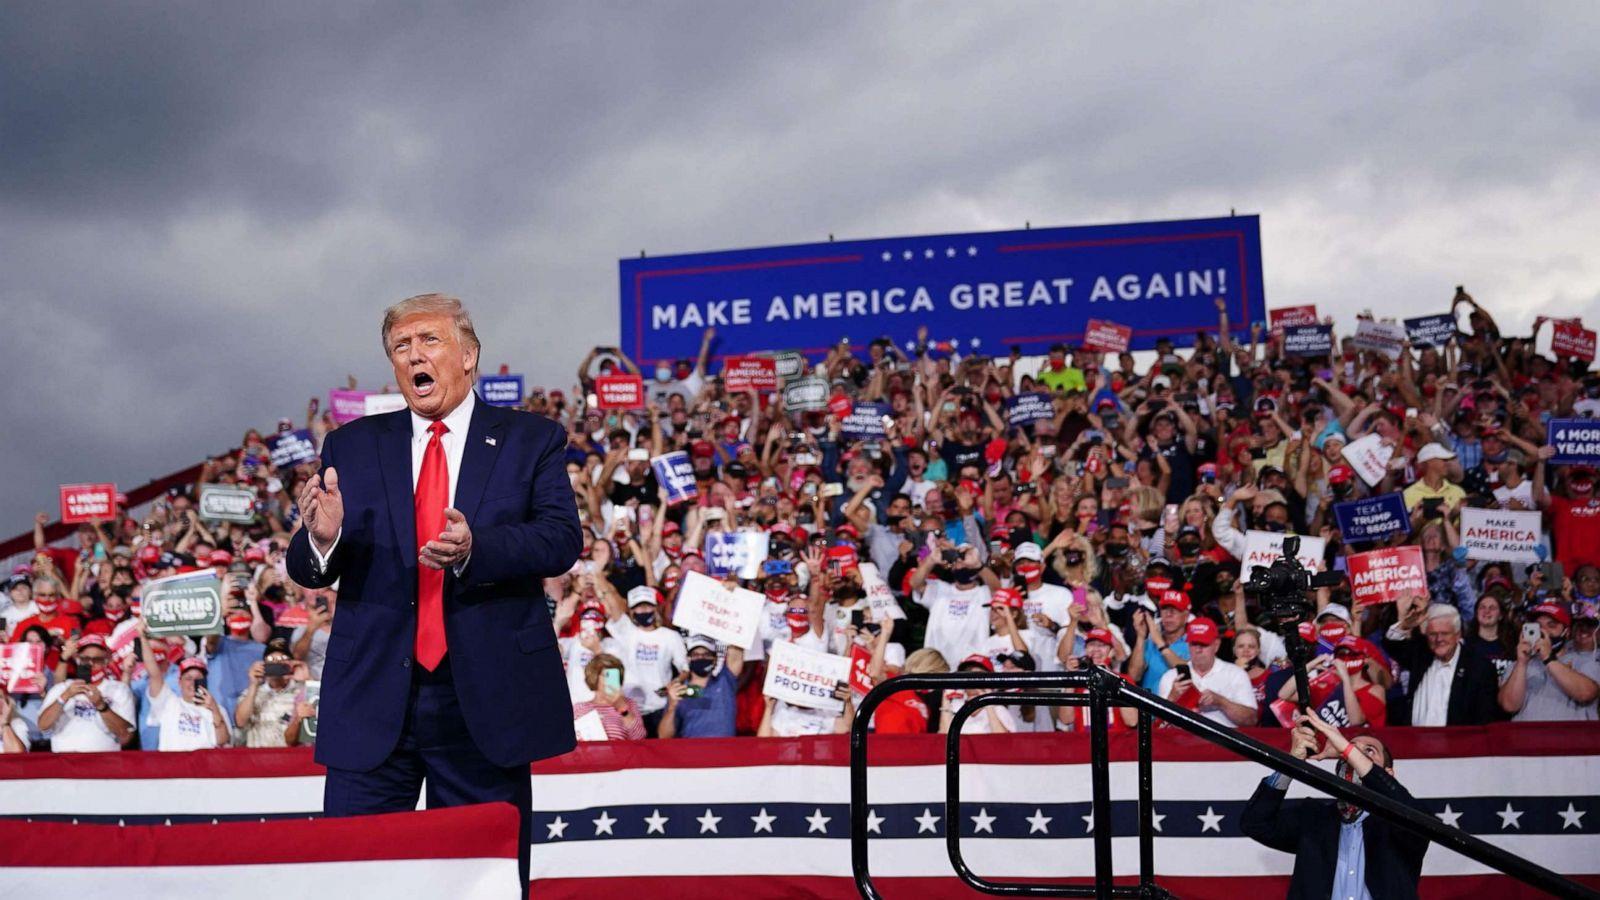 Trump to rally in Michigan on heels of Biden visit - ABC News